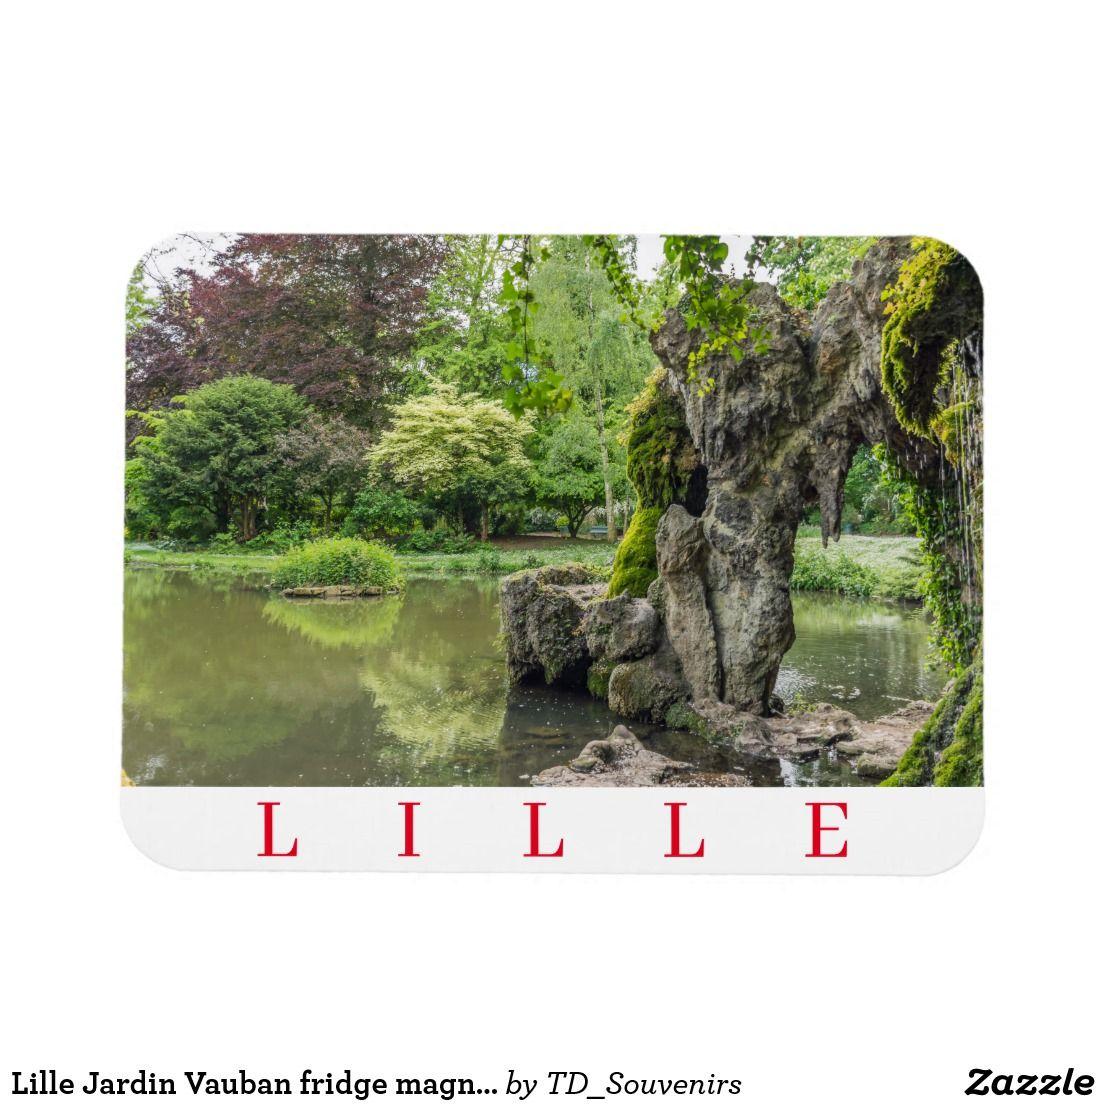 Lille Jardin Vauban Fridge Magnet Zazzle Co Uk Magnets